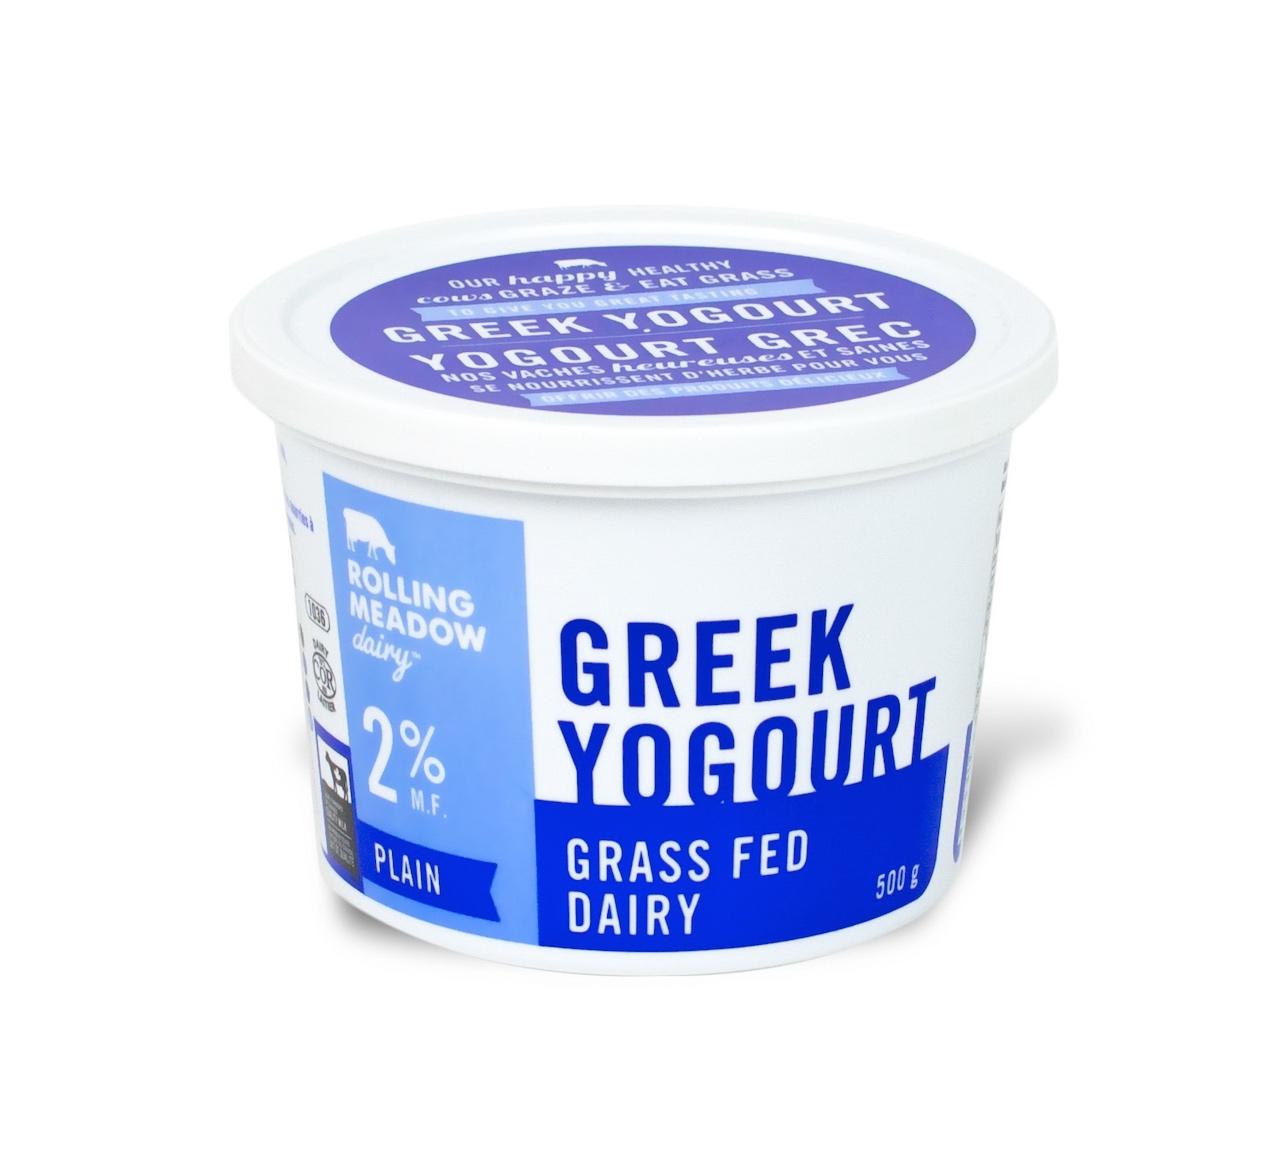 2% Plain Greek Yogourt